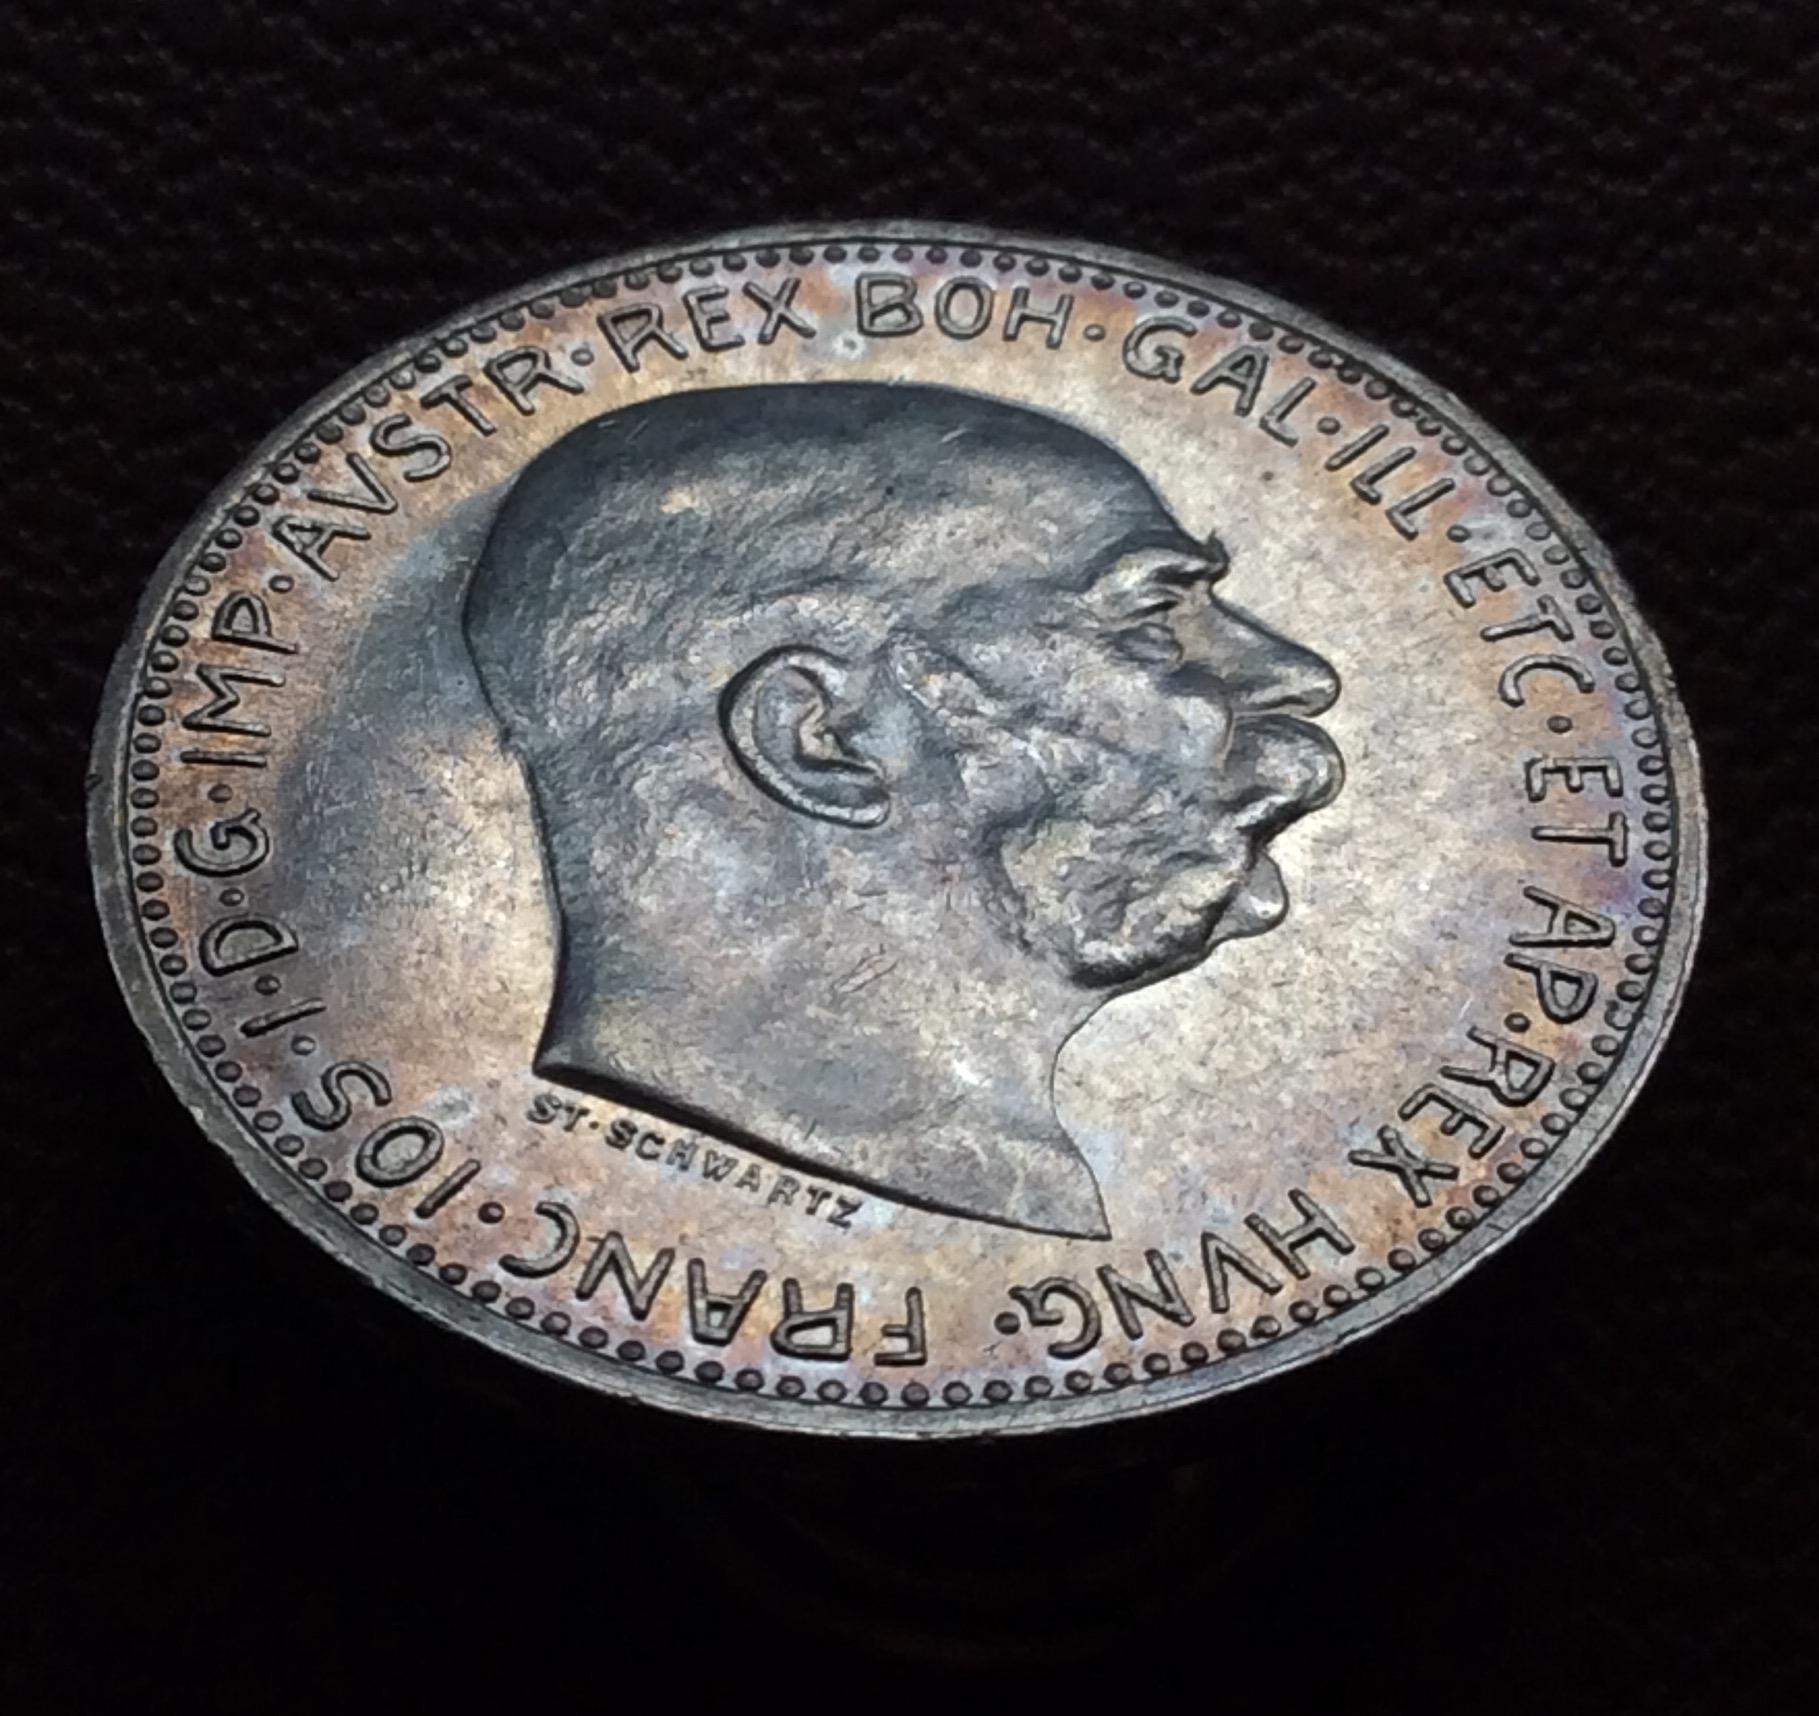 1 CORONA DE PLATA DE 1914 - FRANZ JOSEPH I - IMPERIO AUSTRO-HÚNGARO